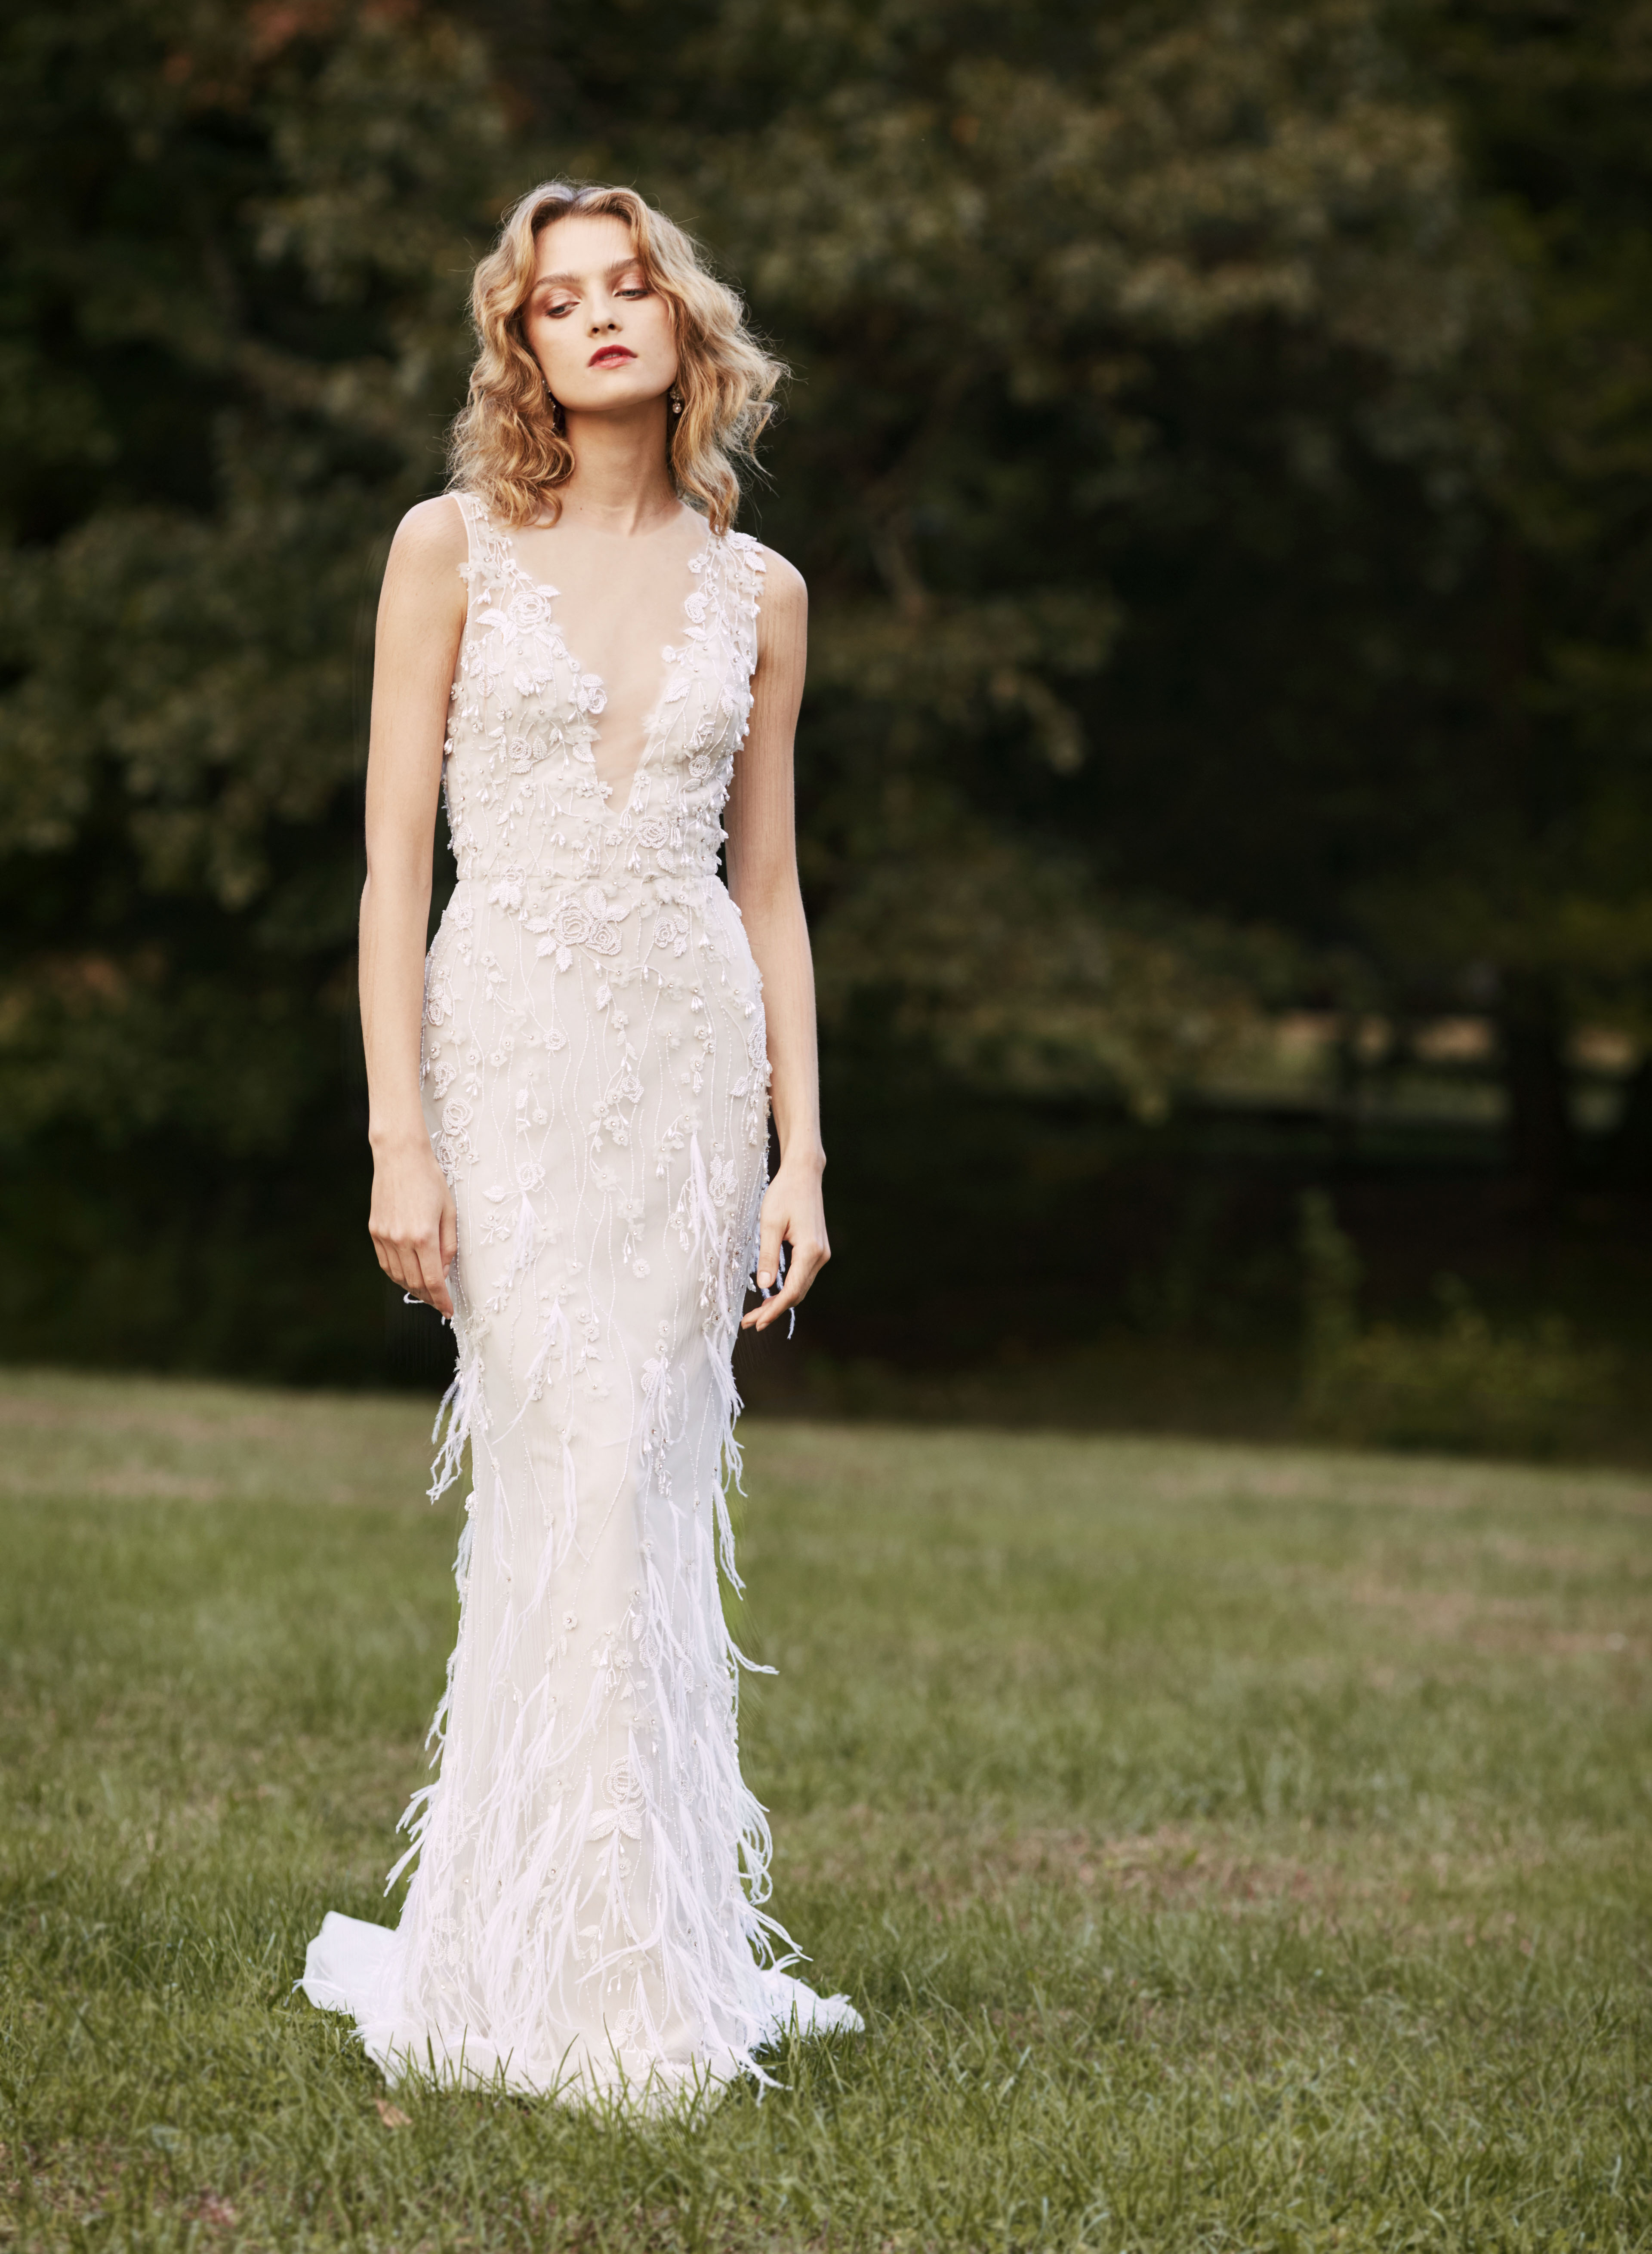 Marchesa plunging v-neck feathers wedding dress fall 2019